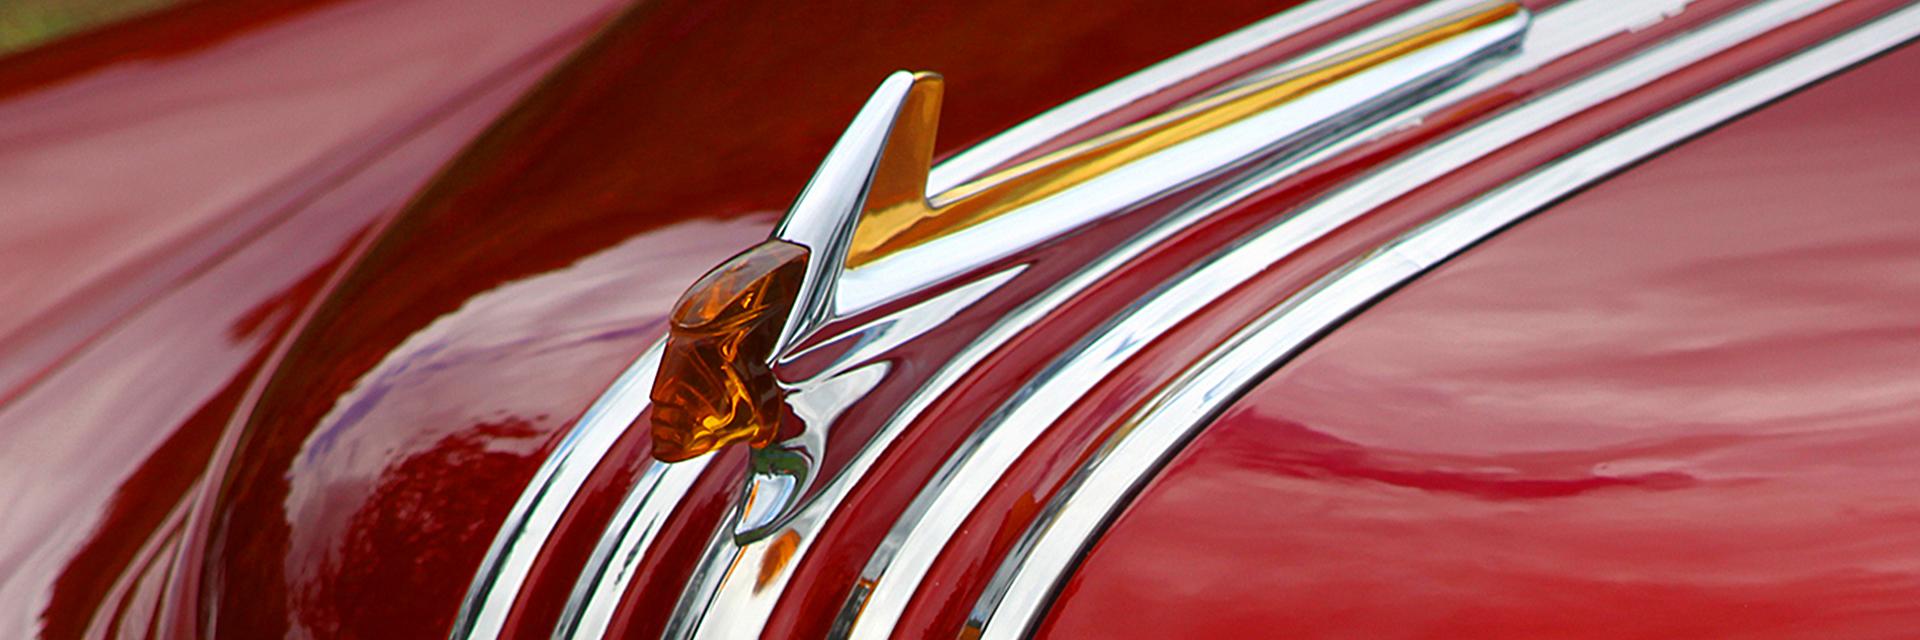 1x3-Pontiac-Hood-Emb_4411-W